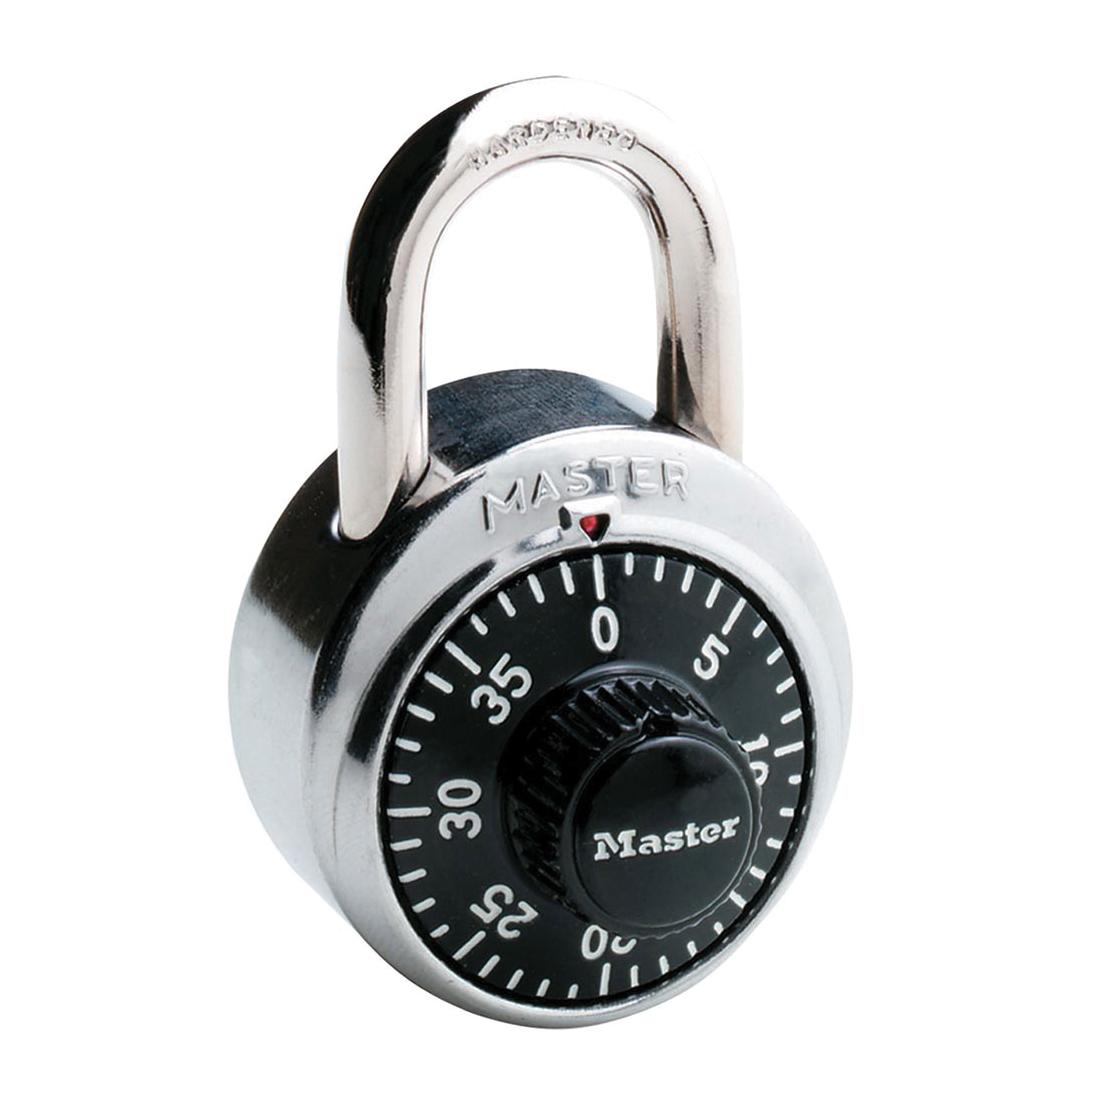 Master Lock® 140KAD Safety Padlock, Alike Key, 1/4 in Shackle, Solid Brass Body, 4-Pin Tumbler Locking